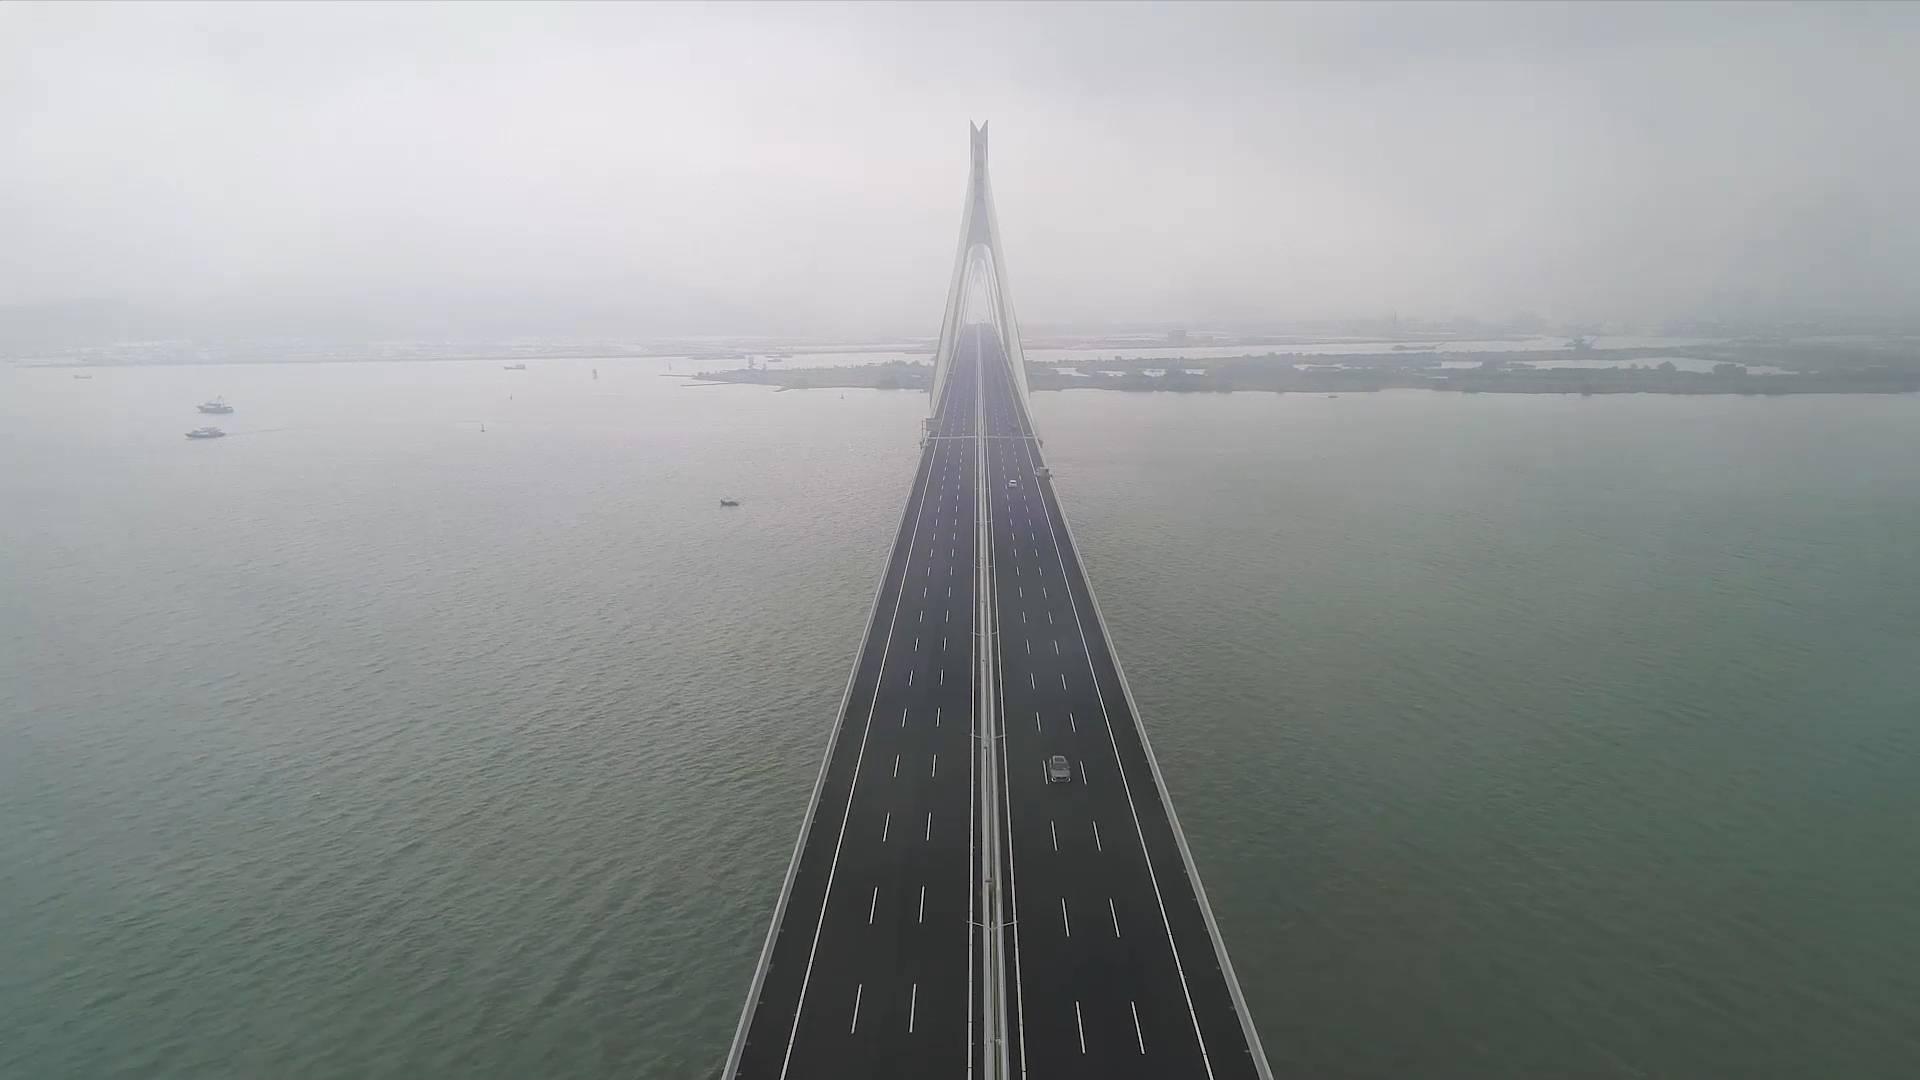 Expressway bridge opens to traffic in Zhuhai, China